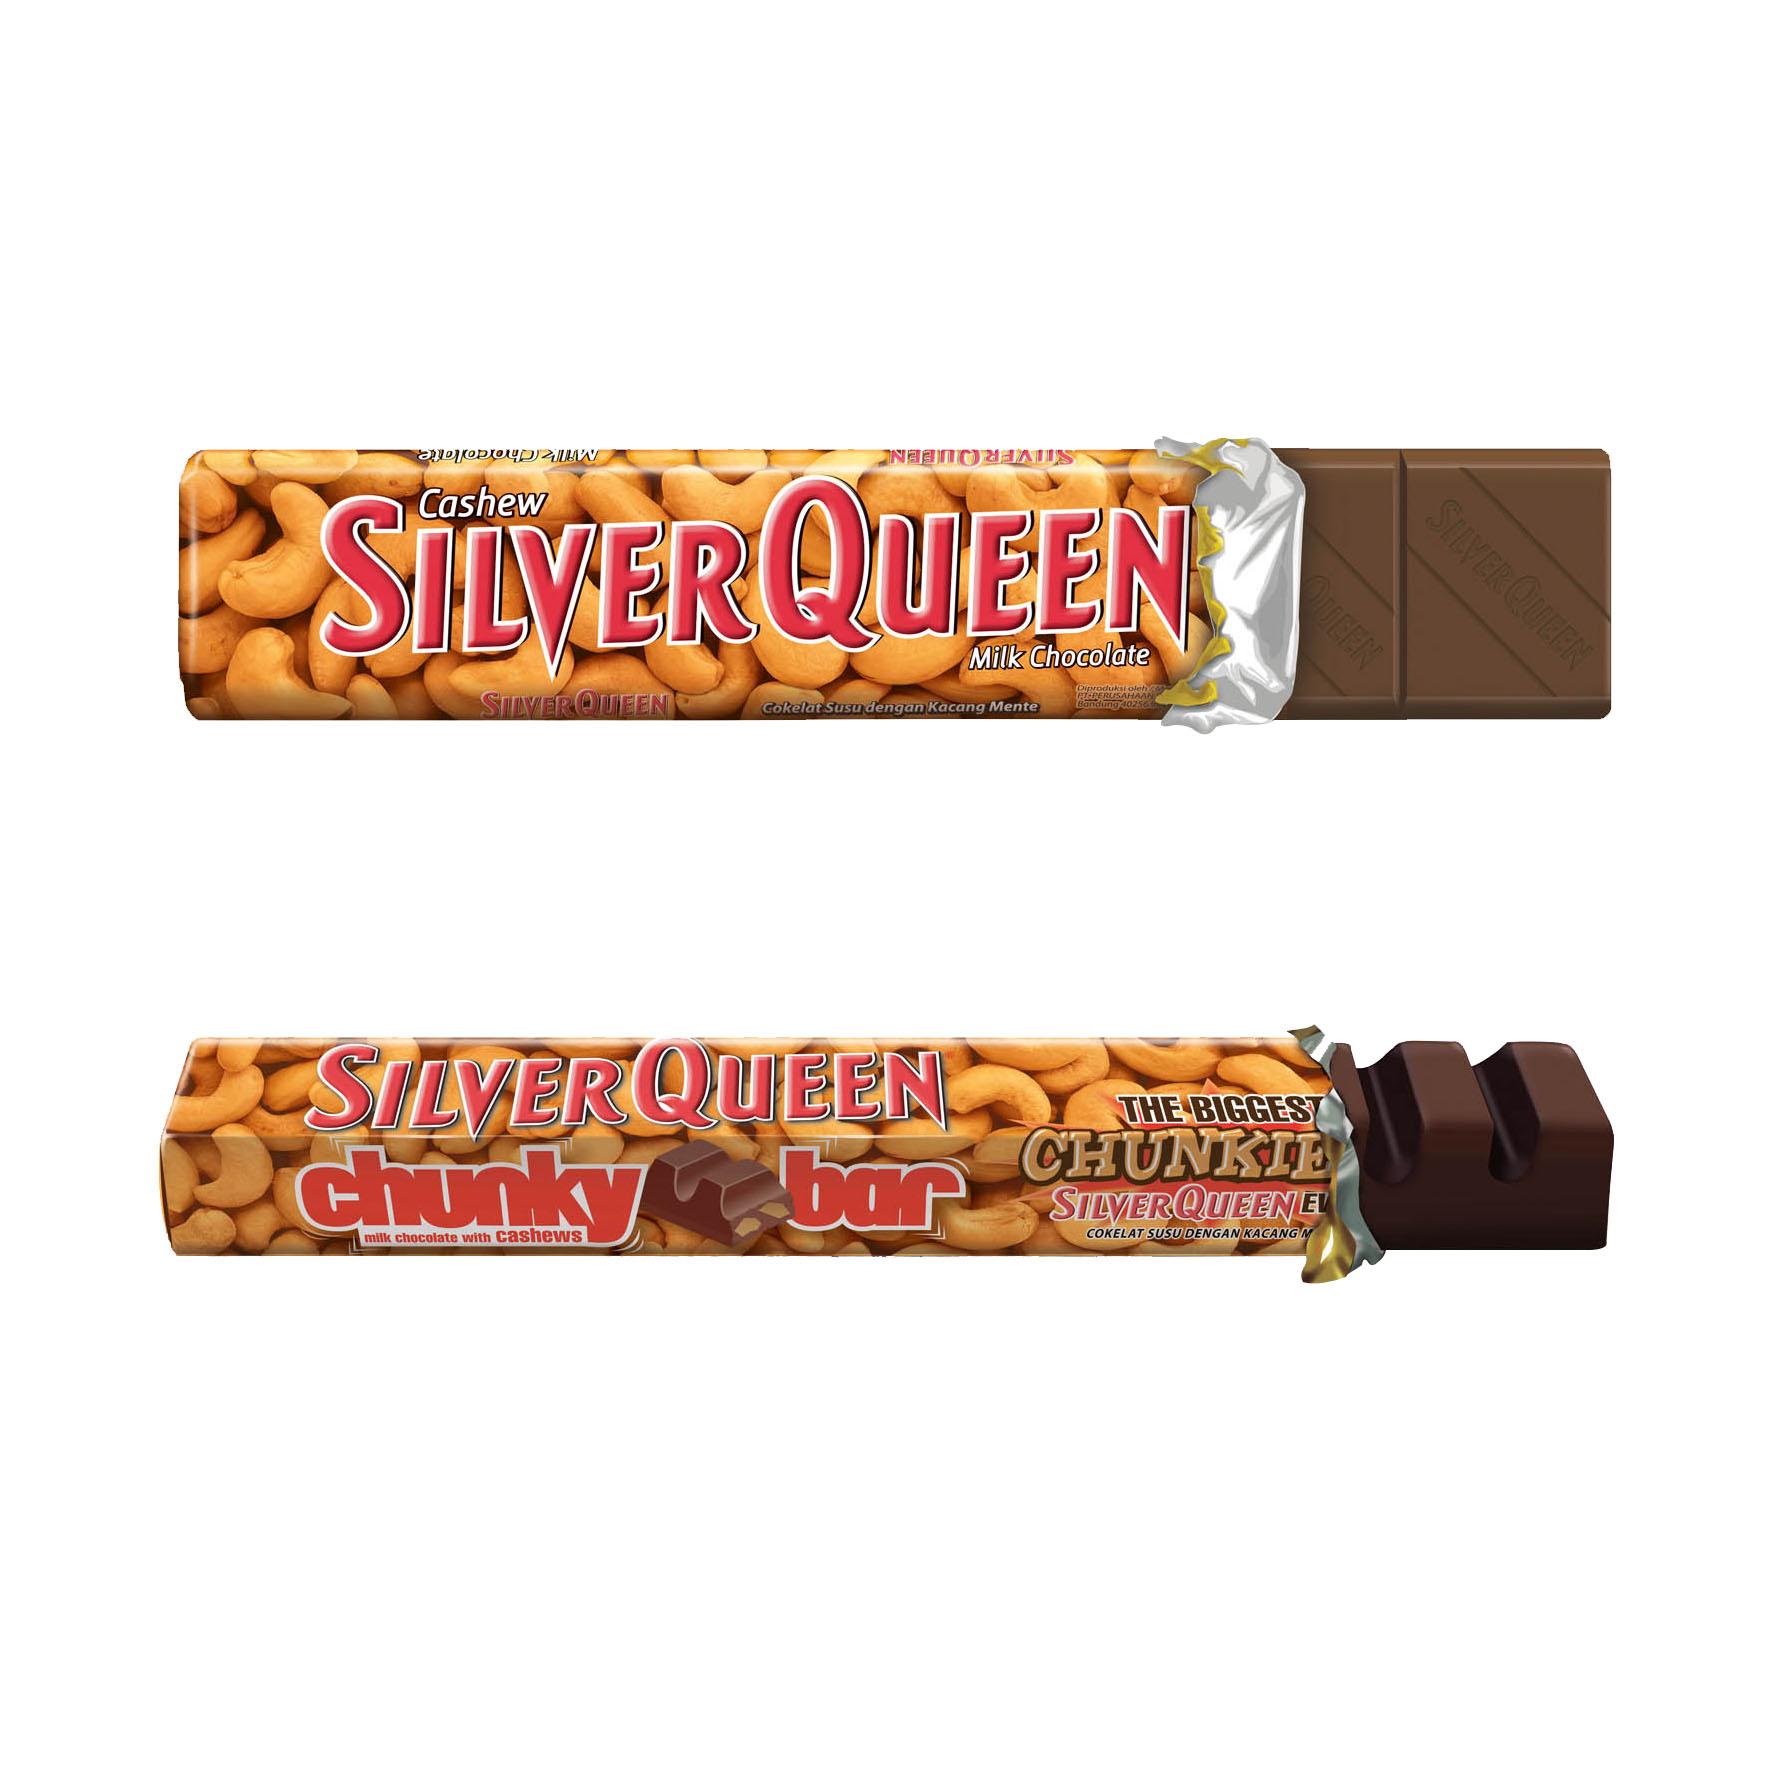 Silverqueen 3d ba22770371